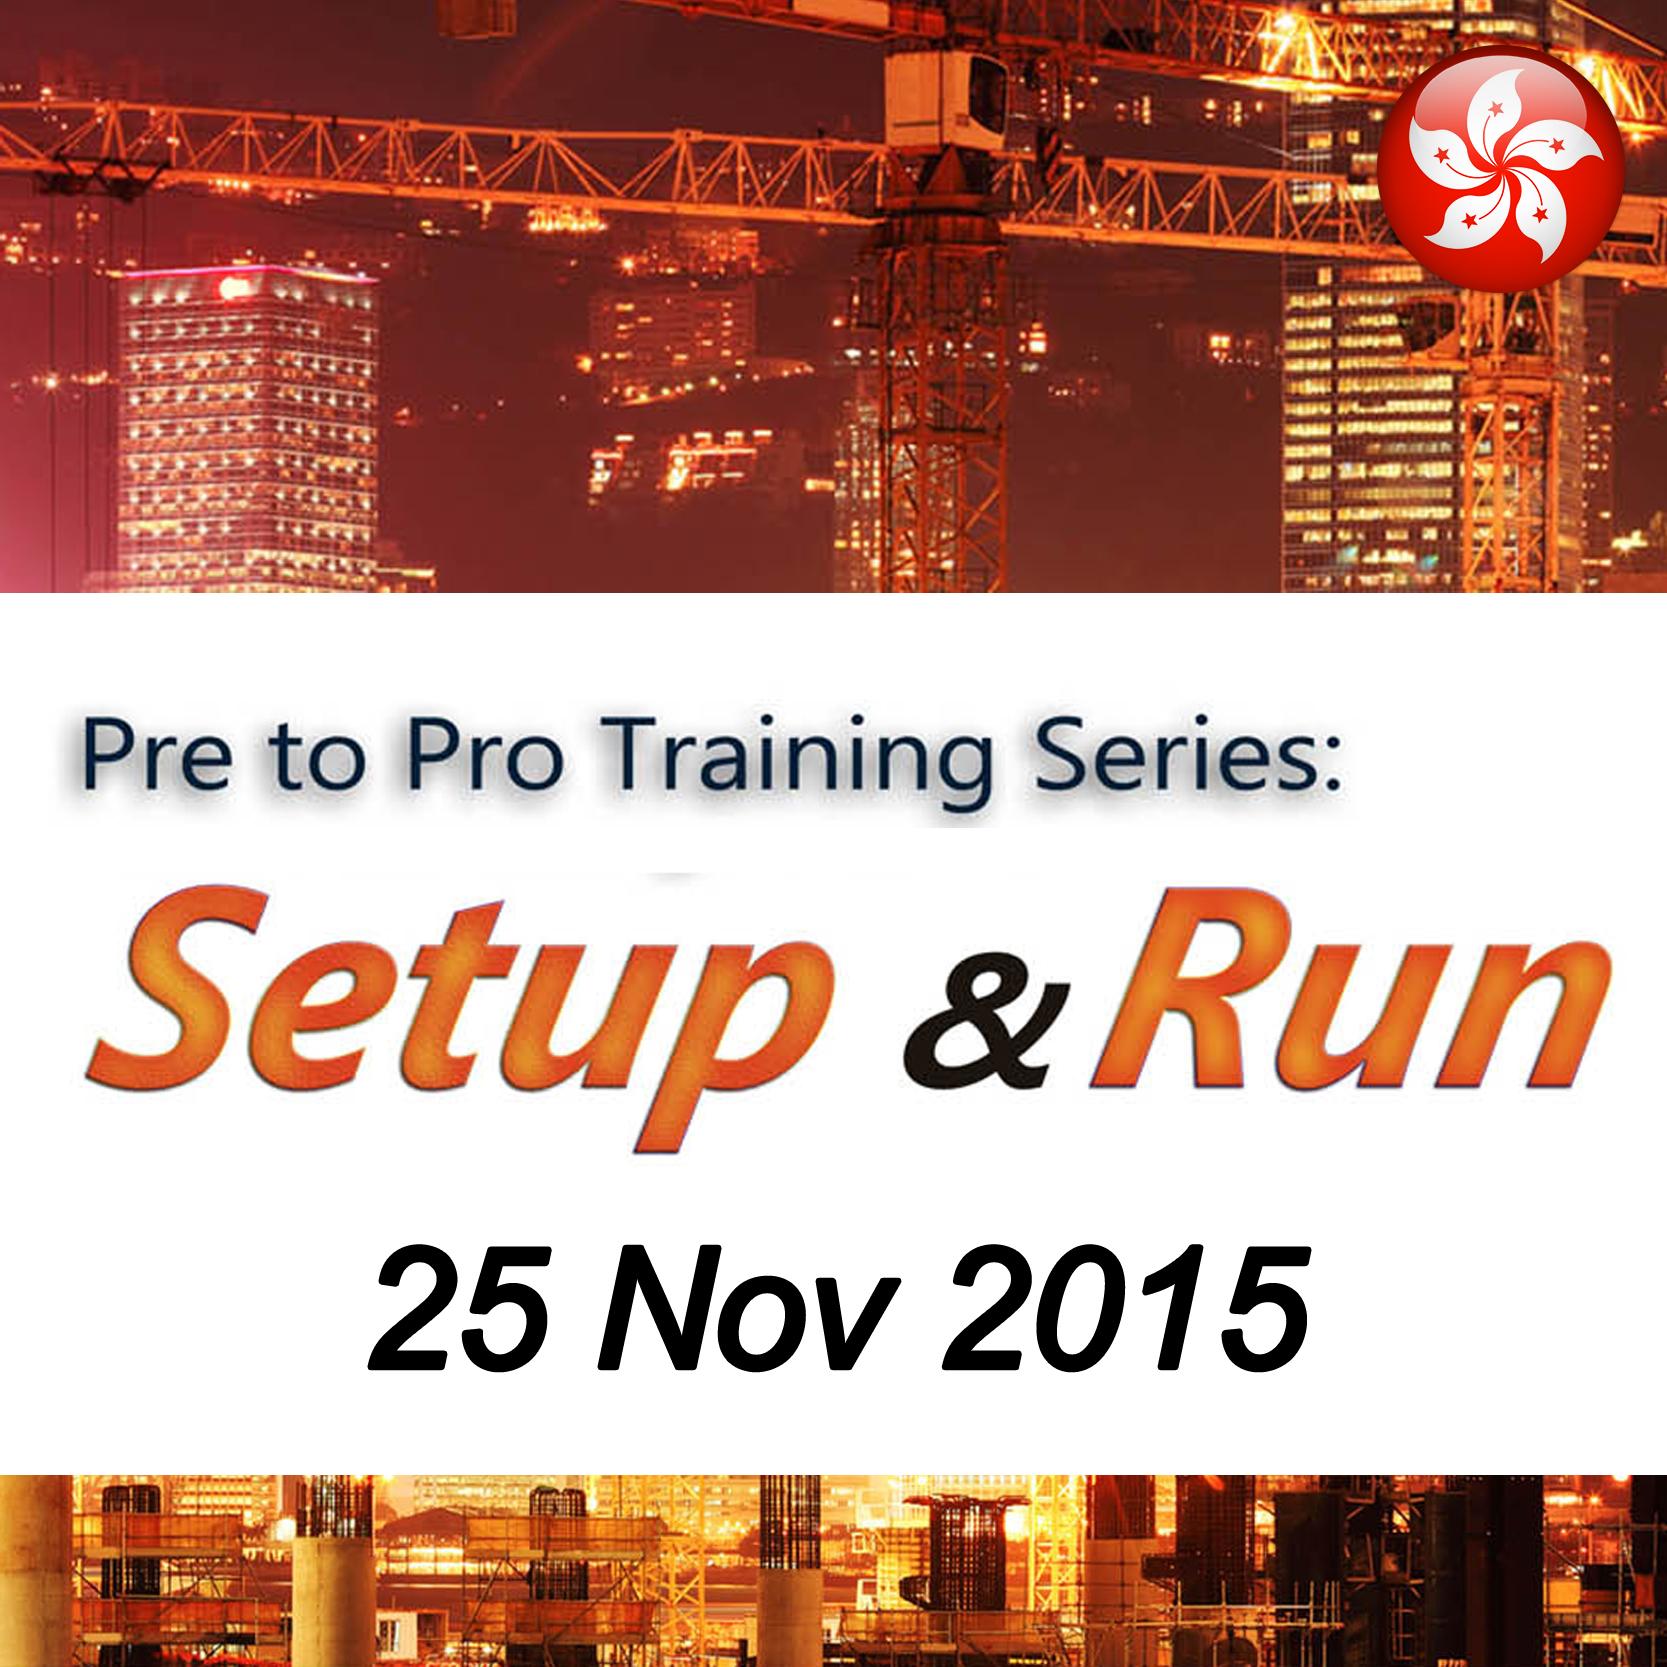 Nov 25 - Pre to Pro Training Series: Setup & Run @ HK